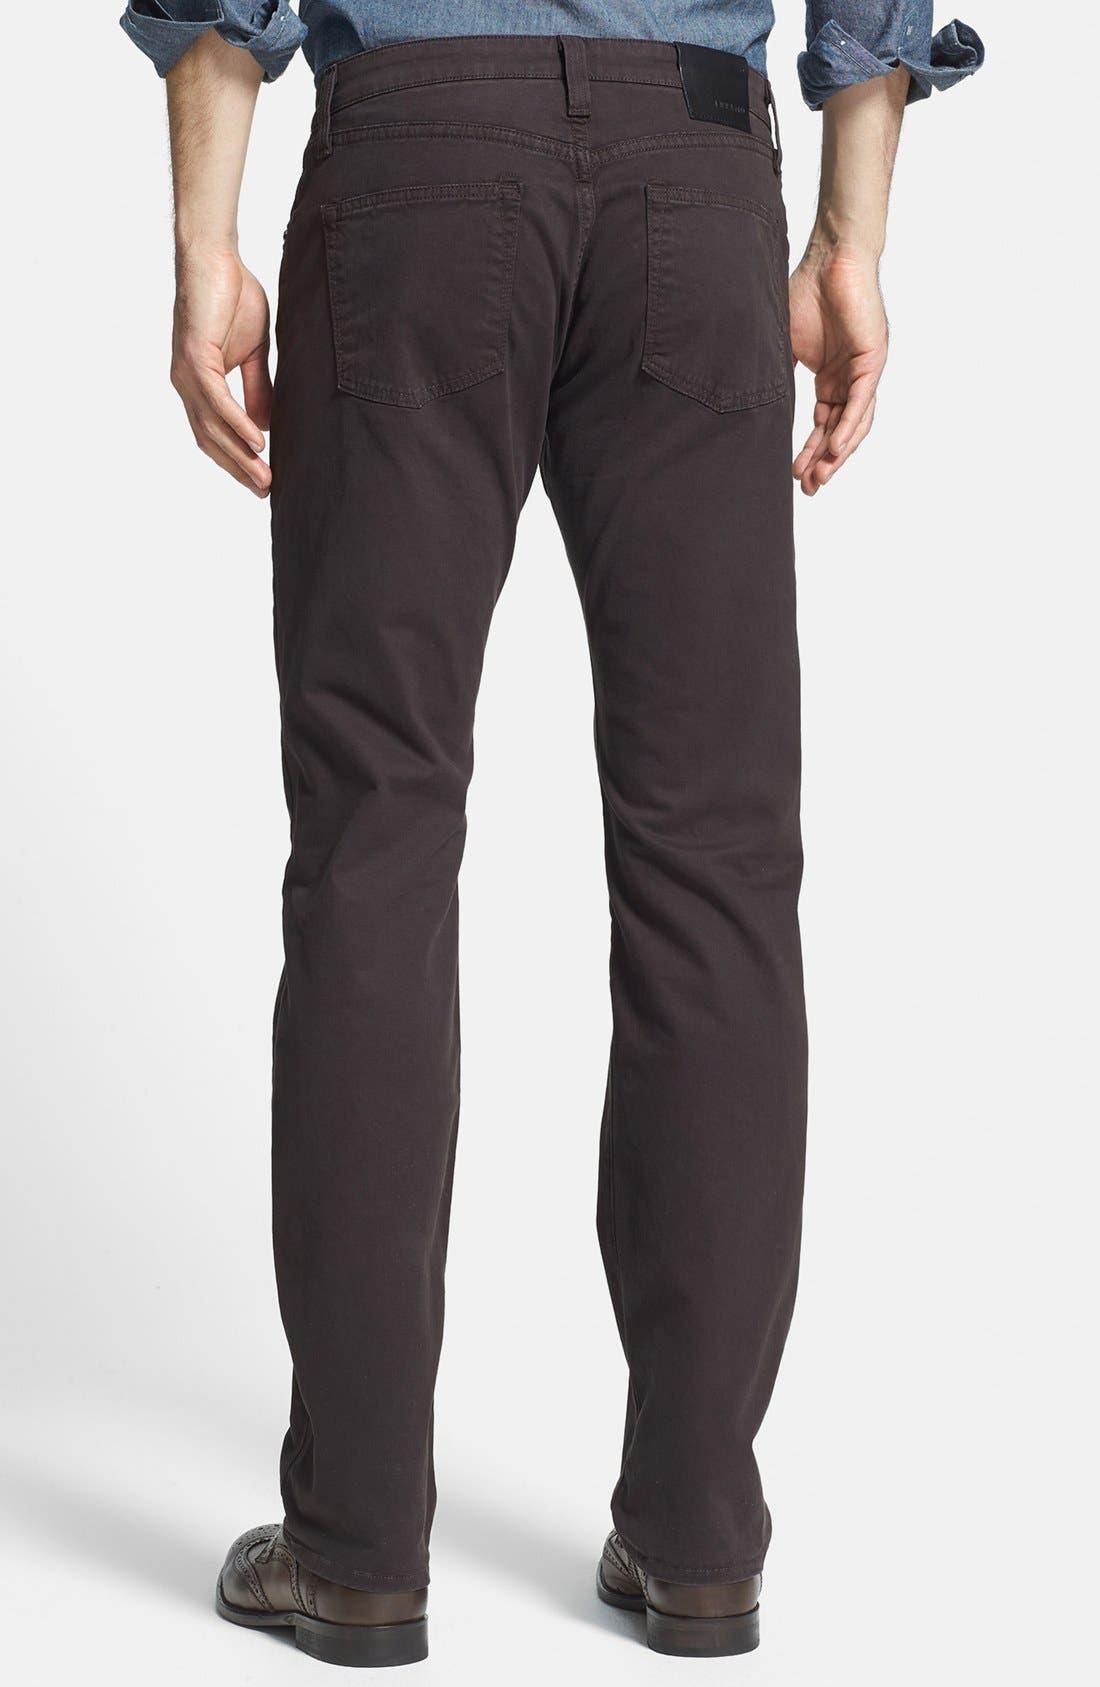 'Kane' Slim Fit Cotton Twill Pants,                             Alternate thumbnail 49, color,